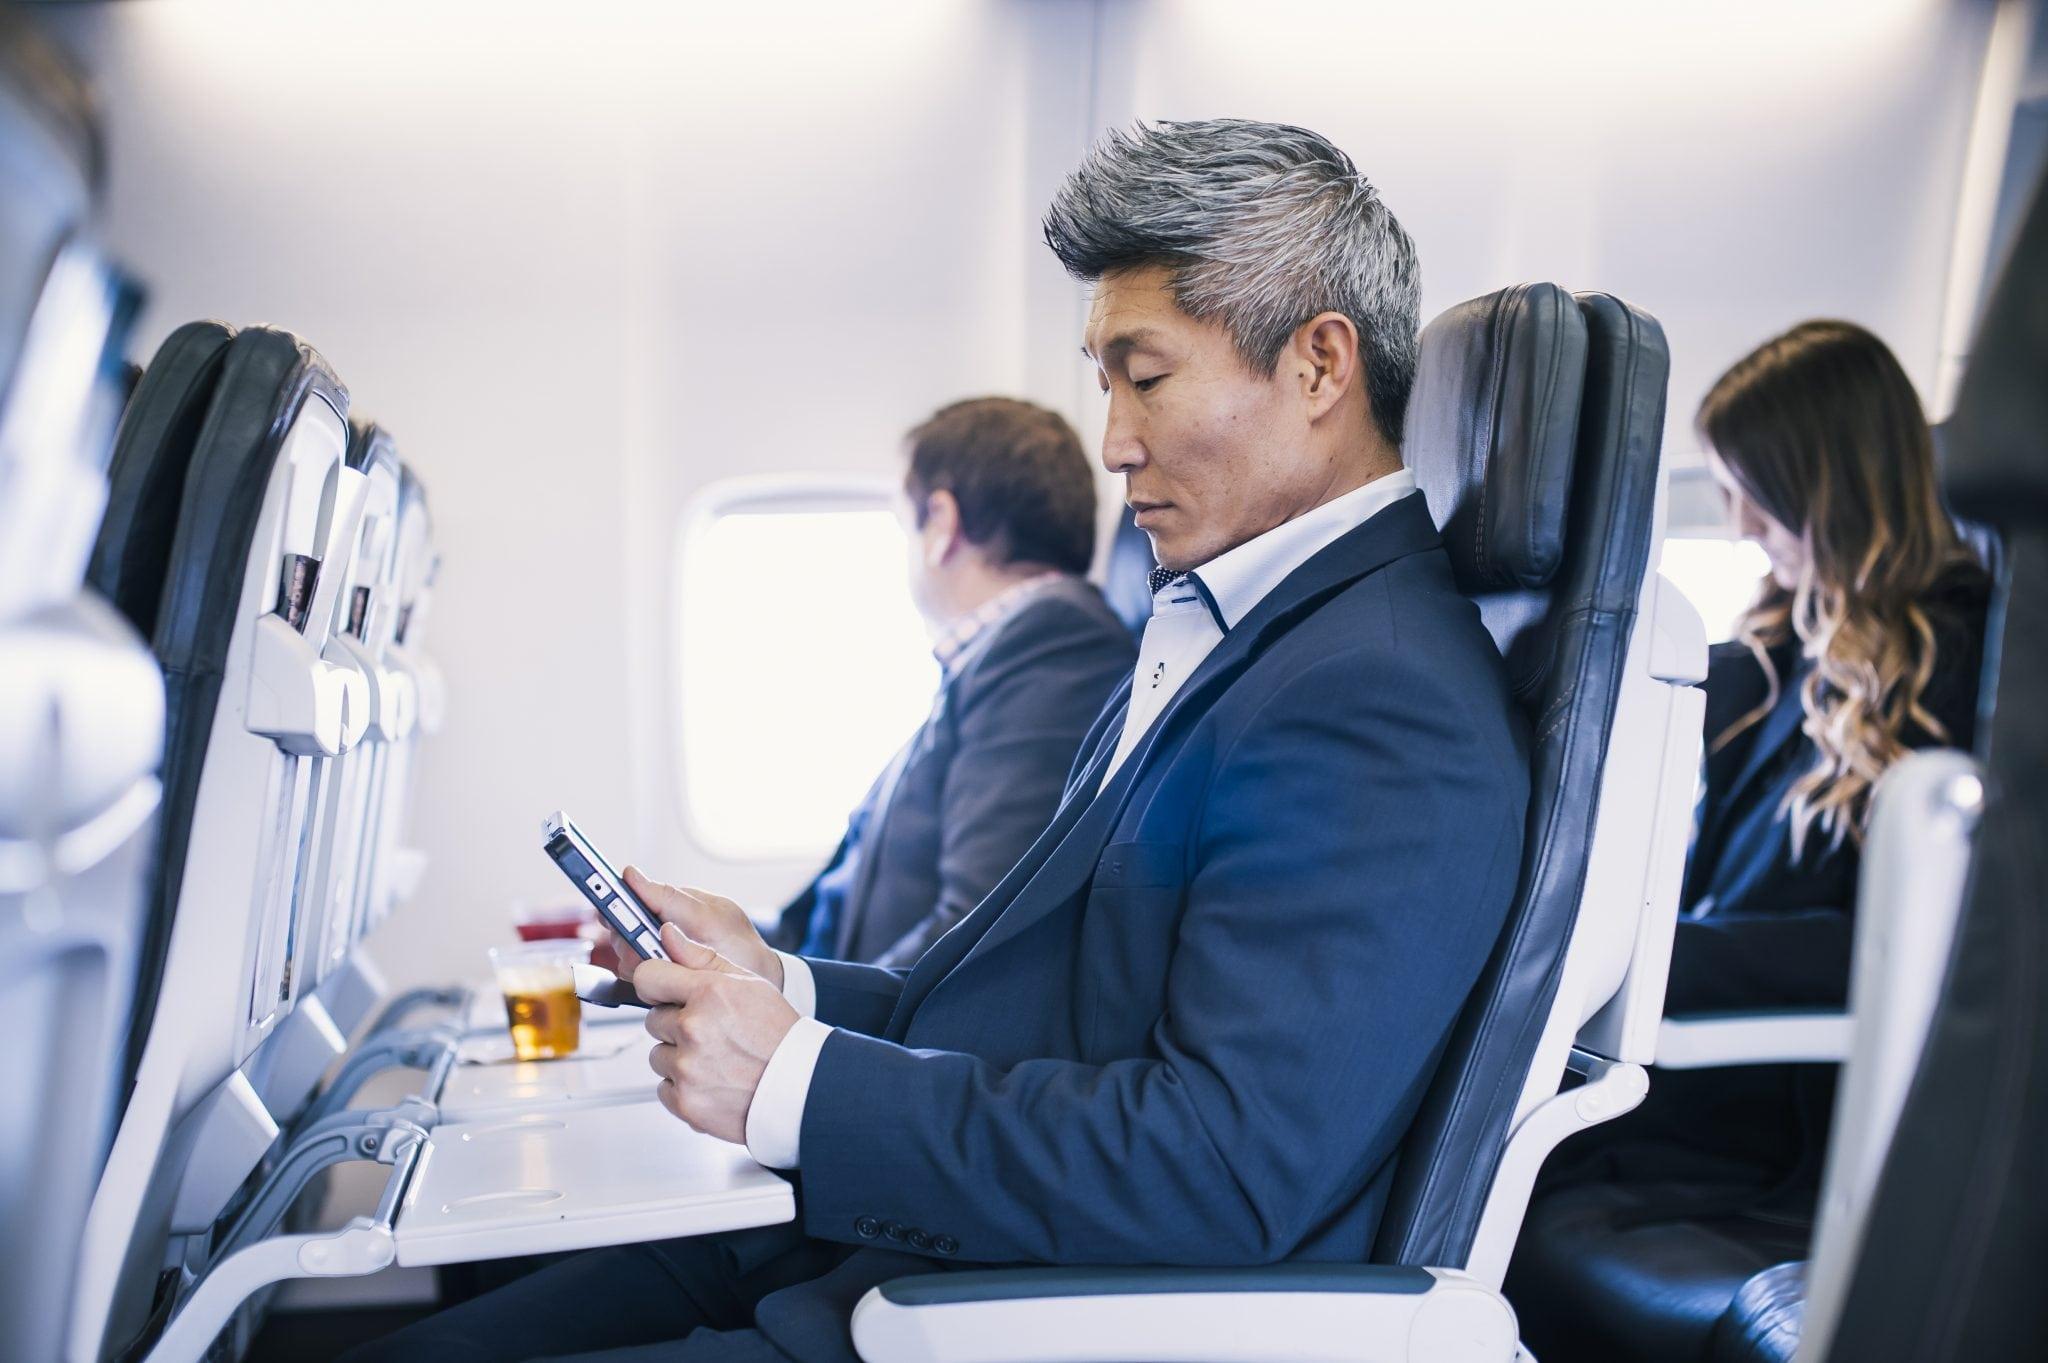 Alaska Air passenger accessing IFE via their personal tablet